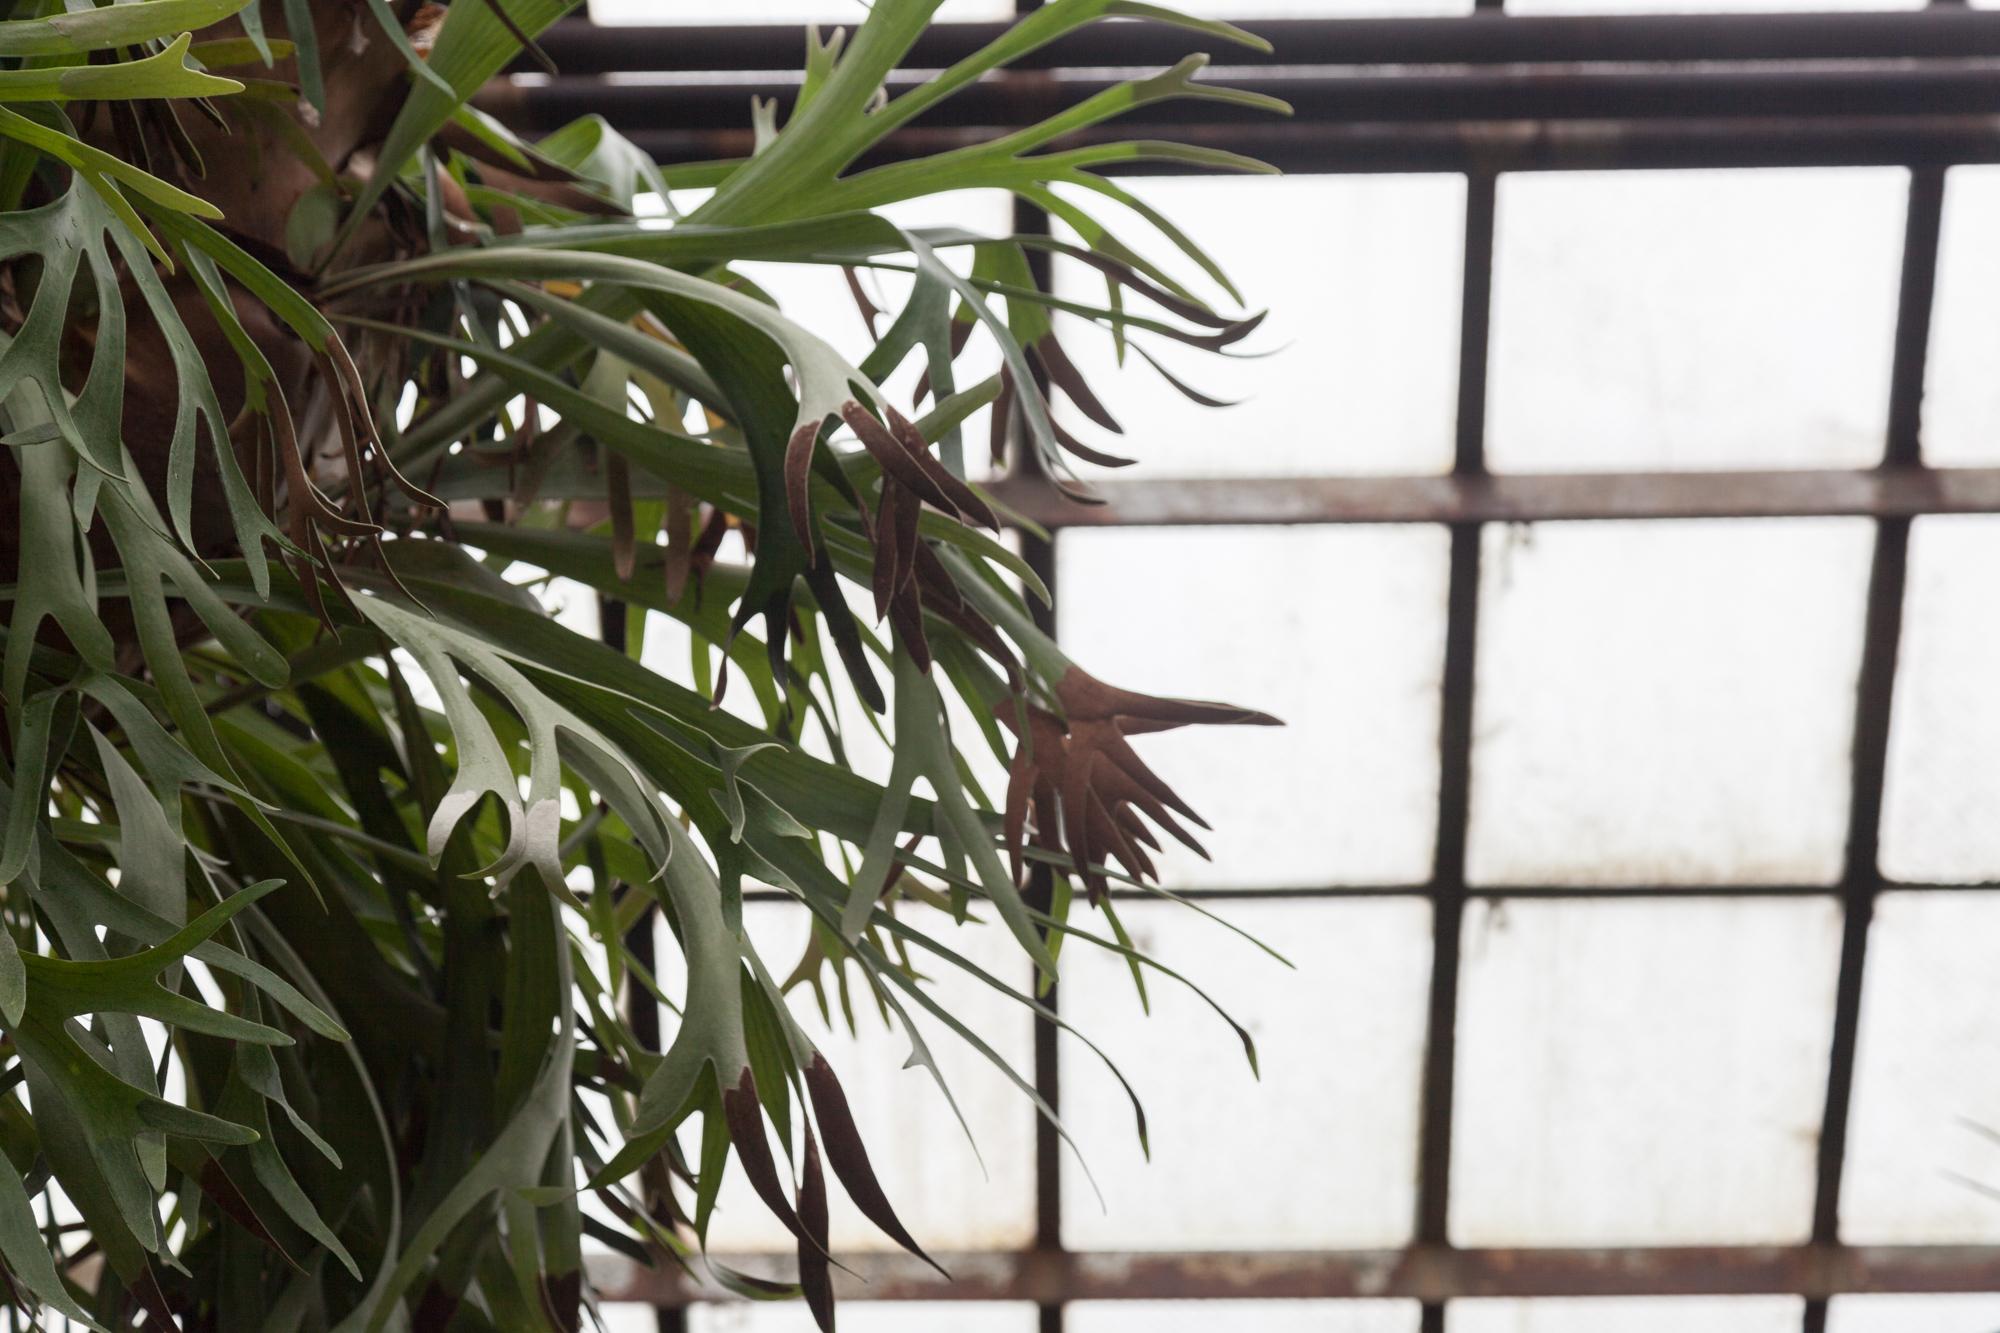 Lincoln-Park-Conservatory-staghorn-fern.jpg